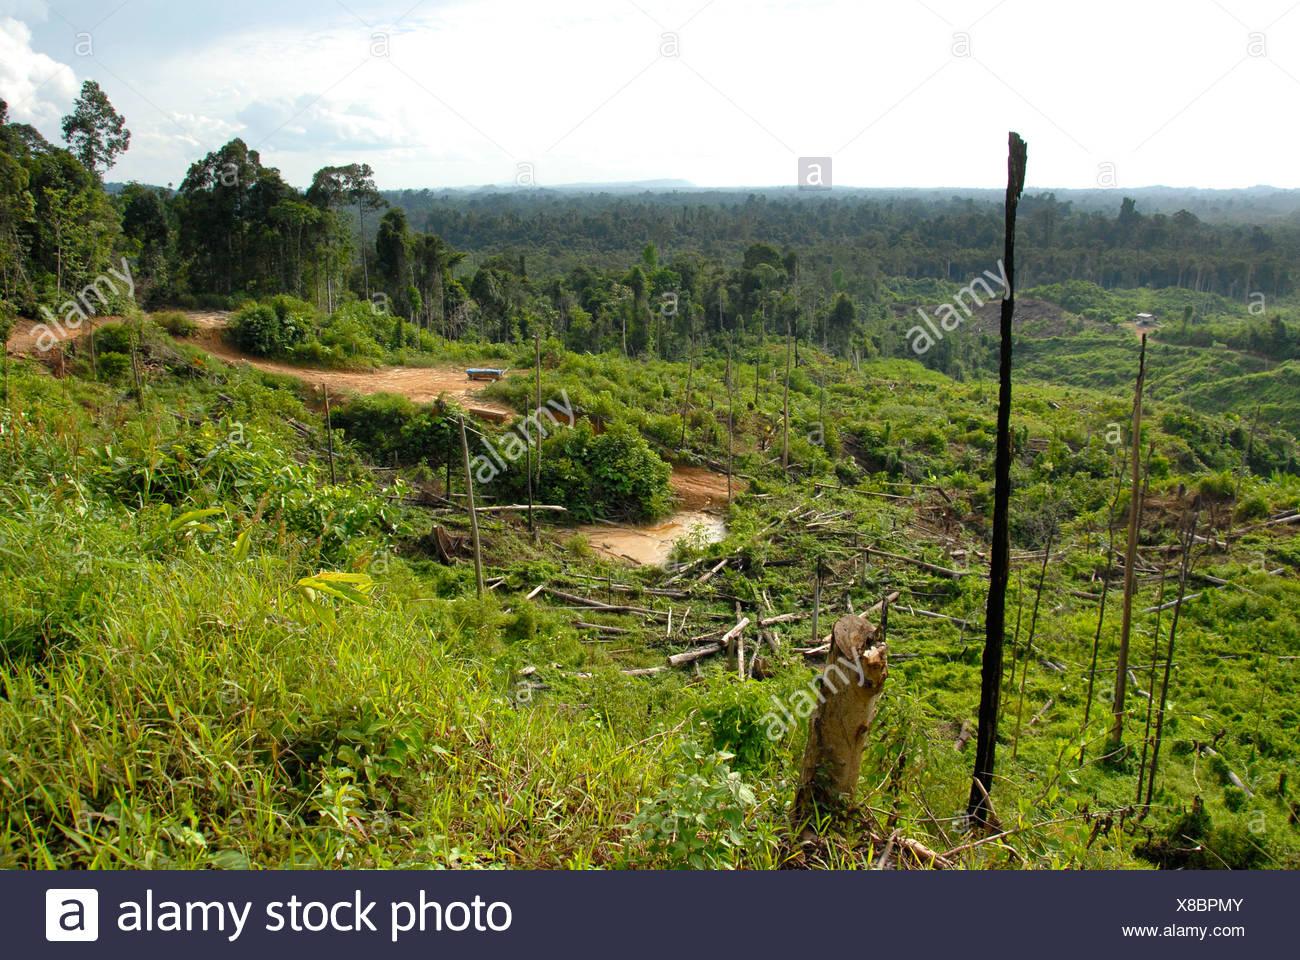 Tropical Deforestation Stock Photos Amp Tropical